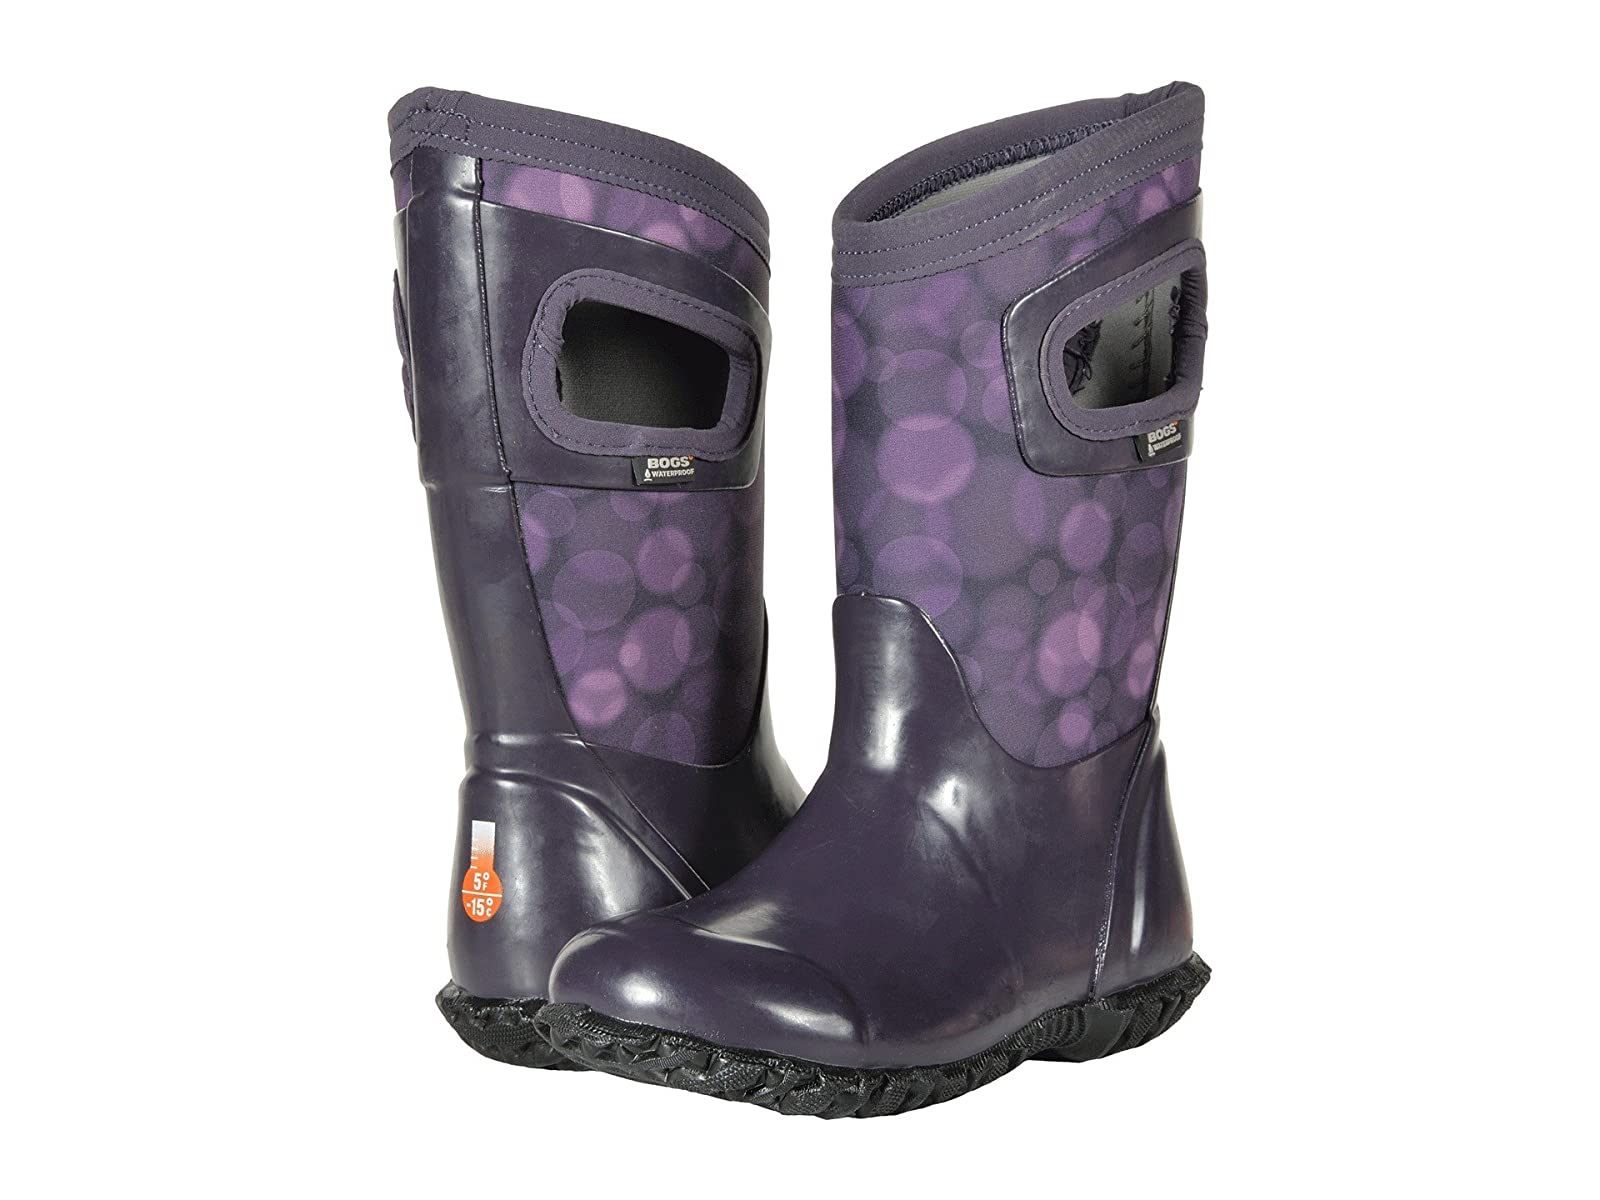 Bogs Kids North Hampton Rain (Toddler/Little Kid/Big Kid)Cheap and distinctive eye-catching shoes